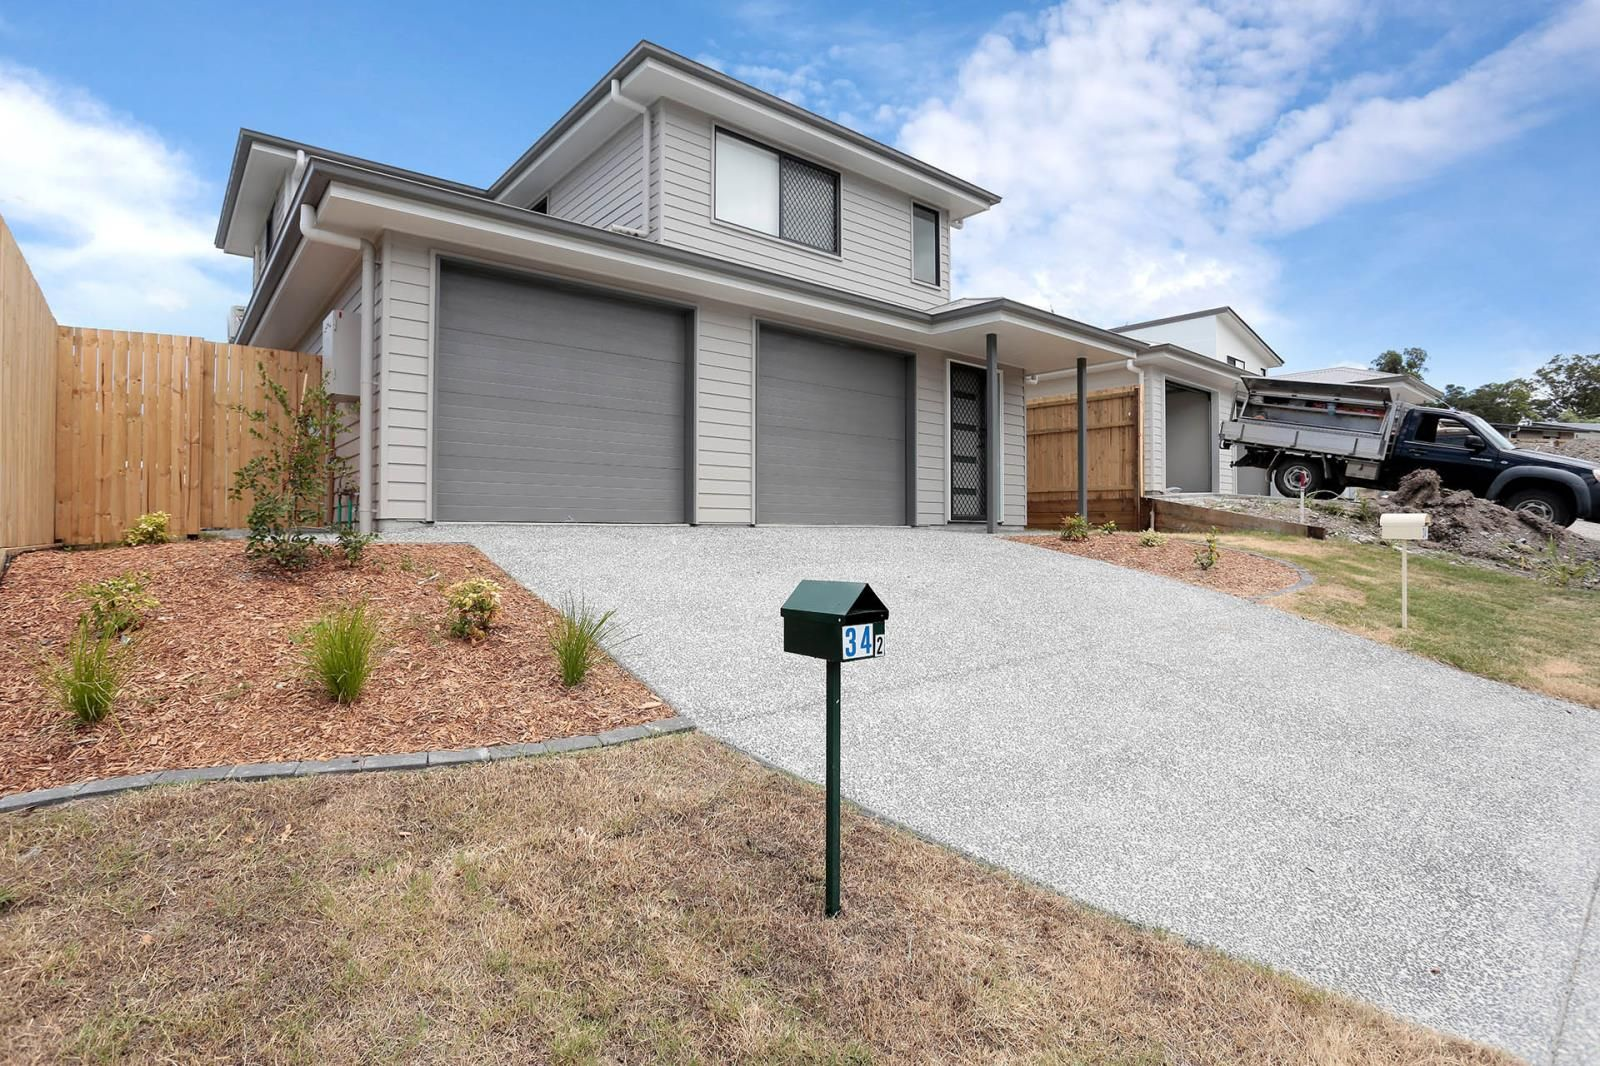 2/34 Dalby Street, Holmview QLD 4207, Image 0